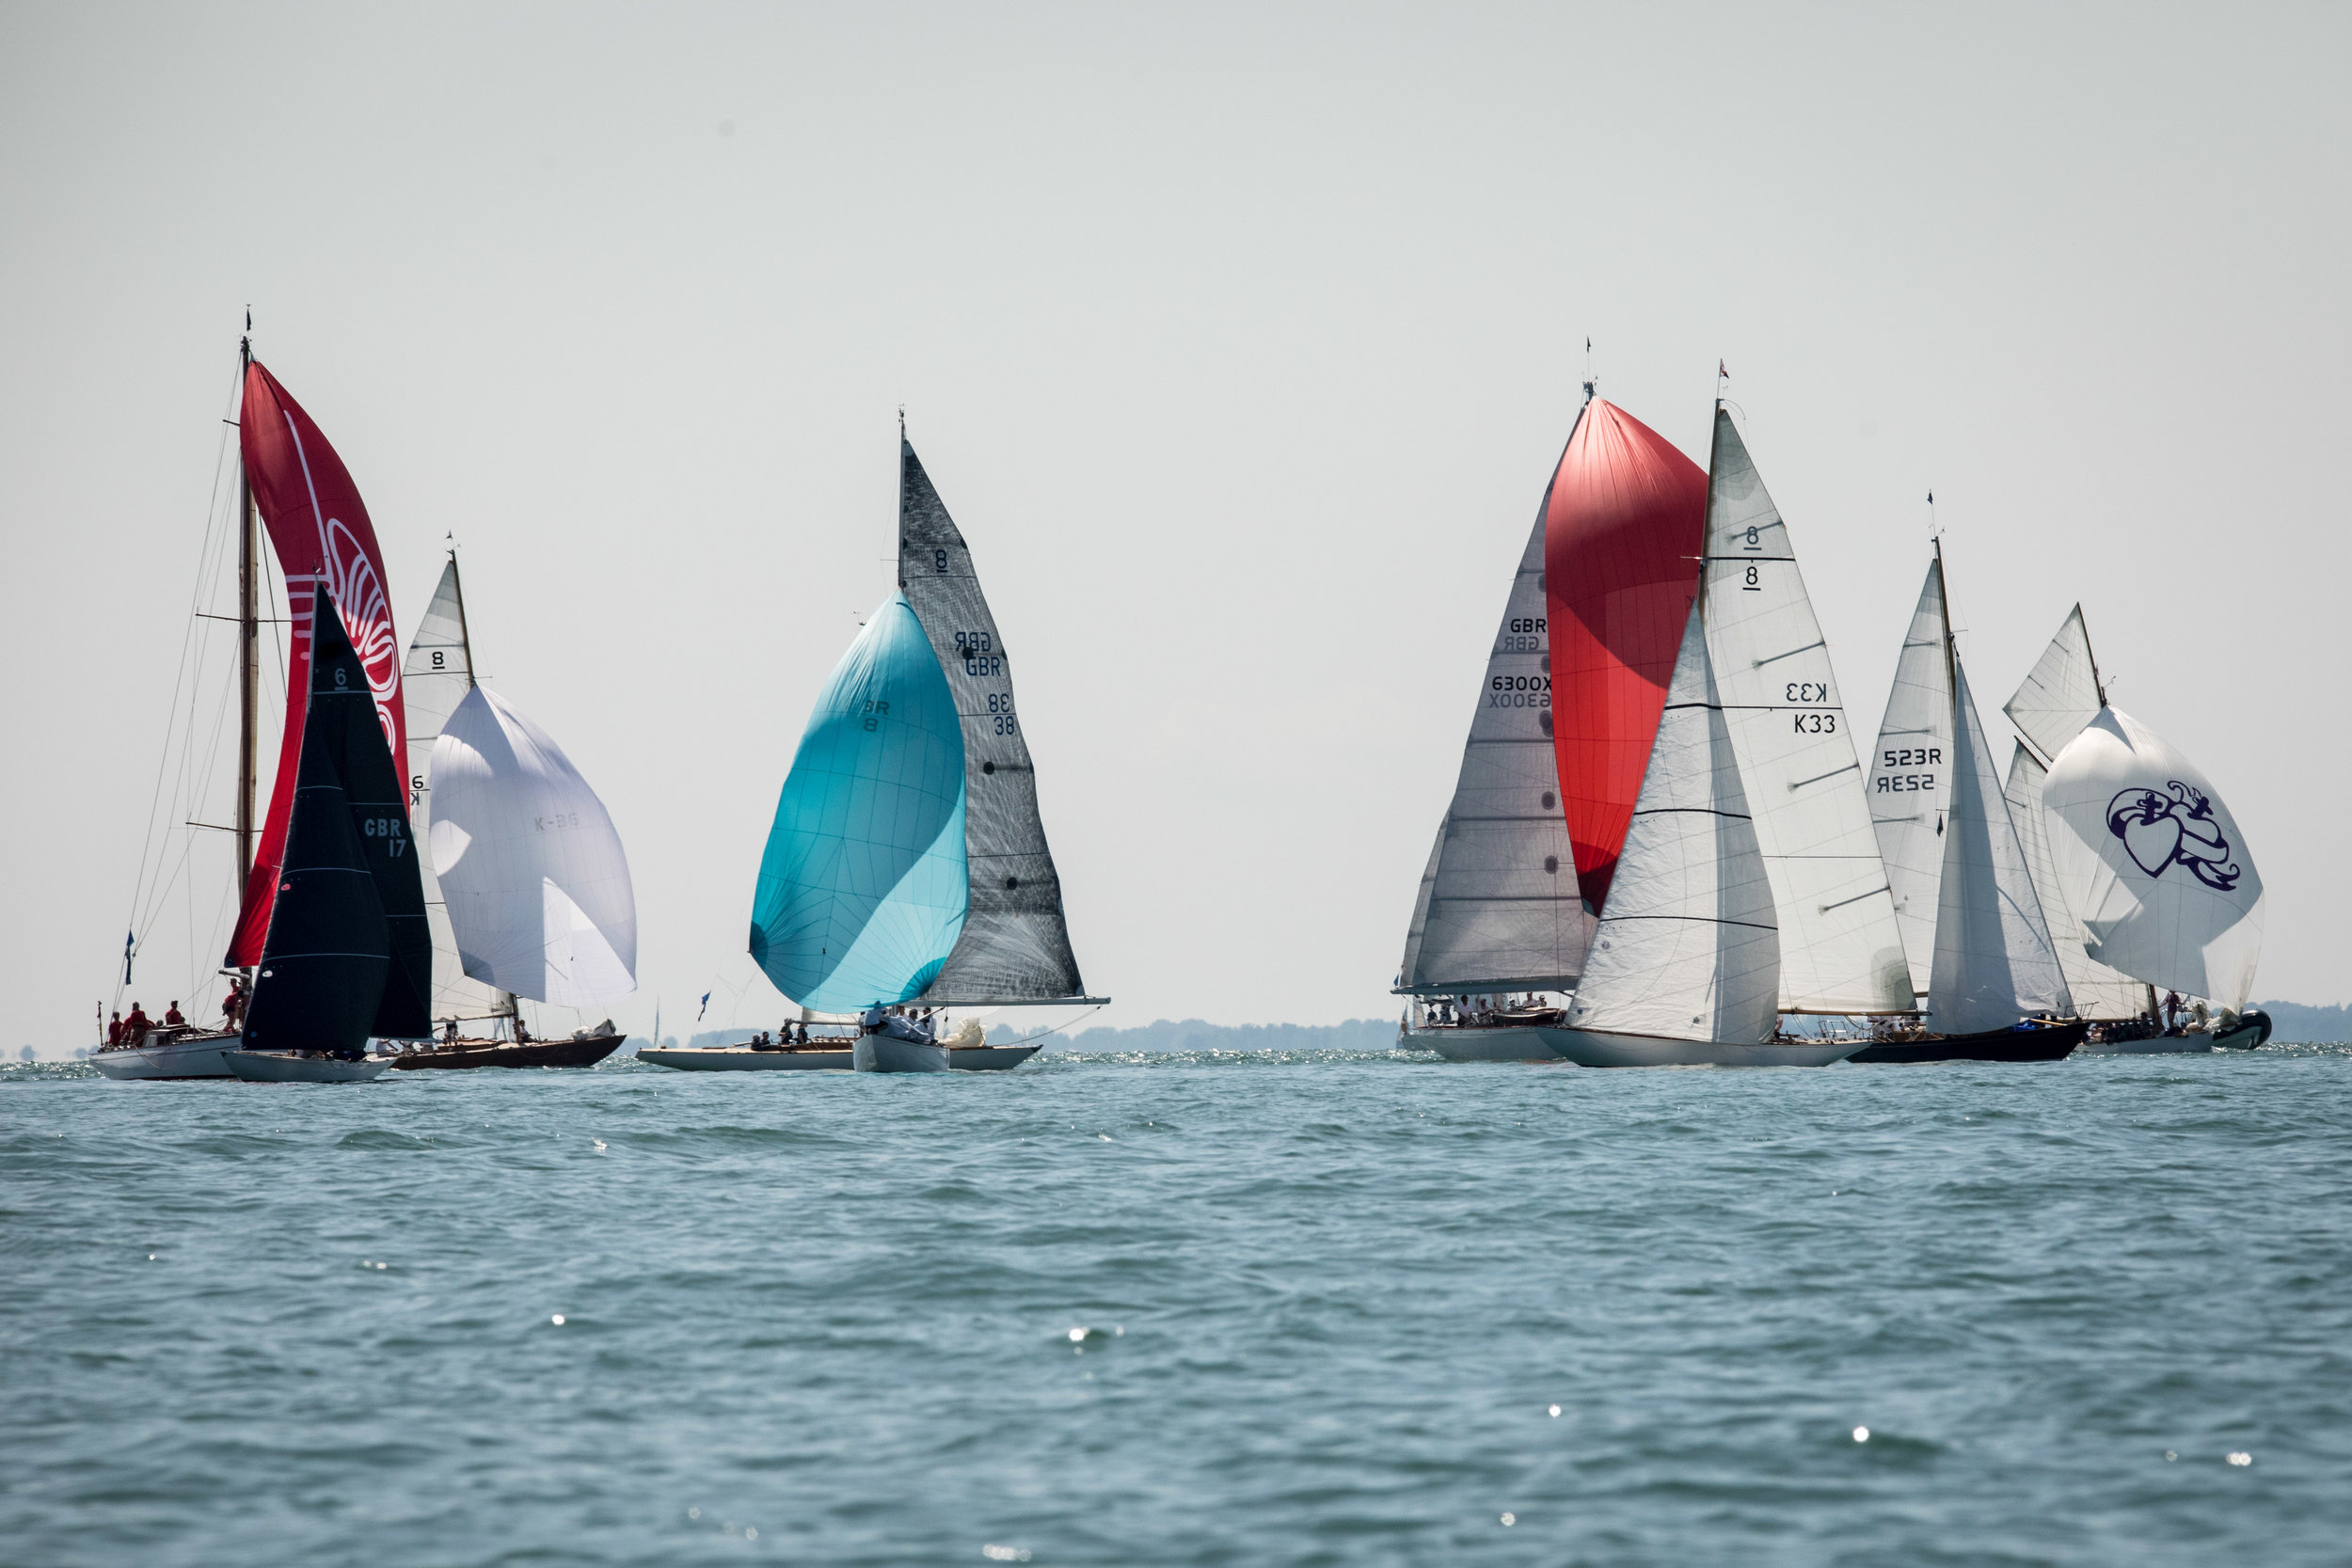 The fleet crept towards the finish line